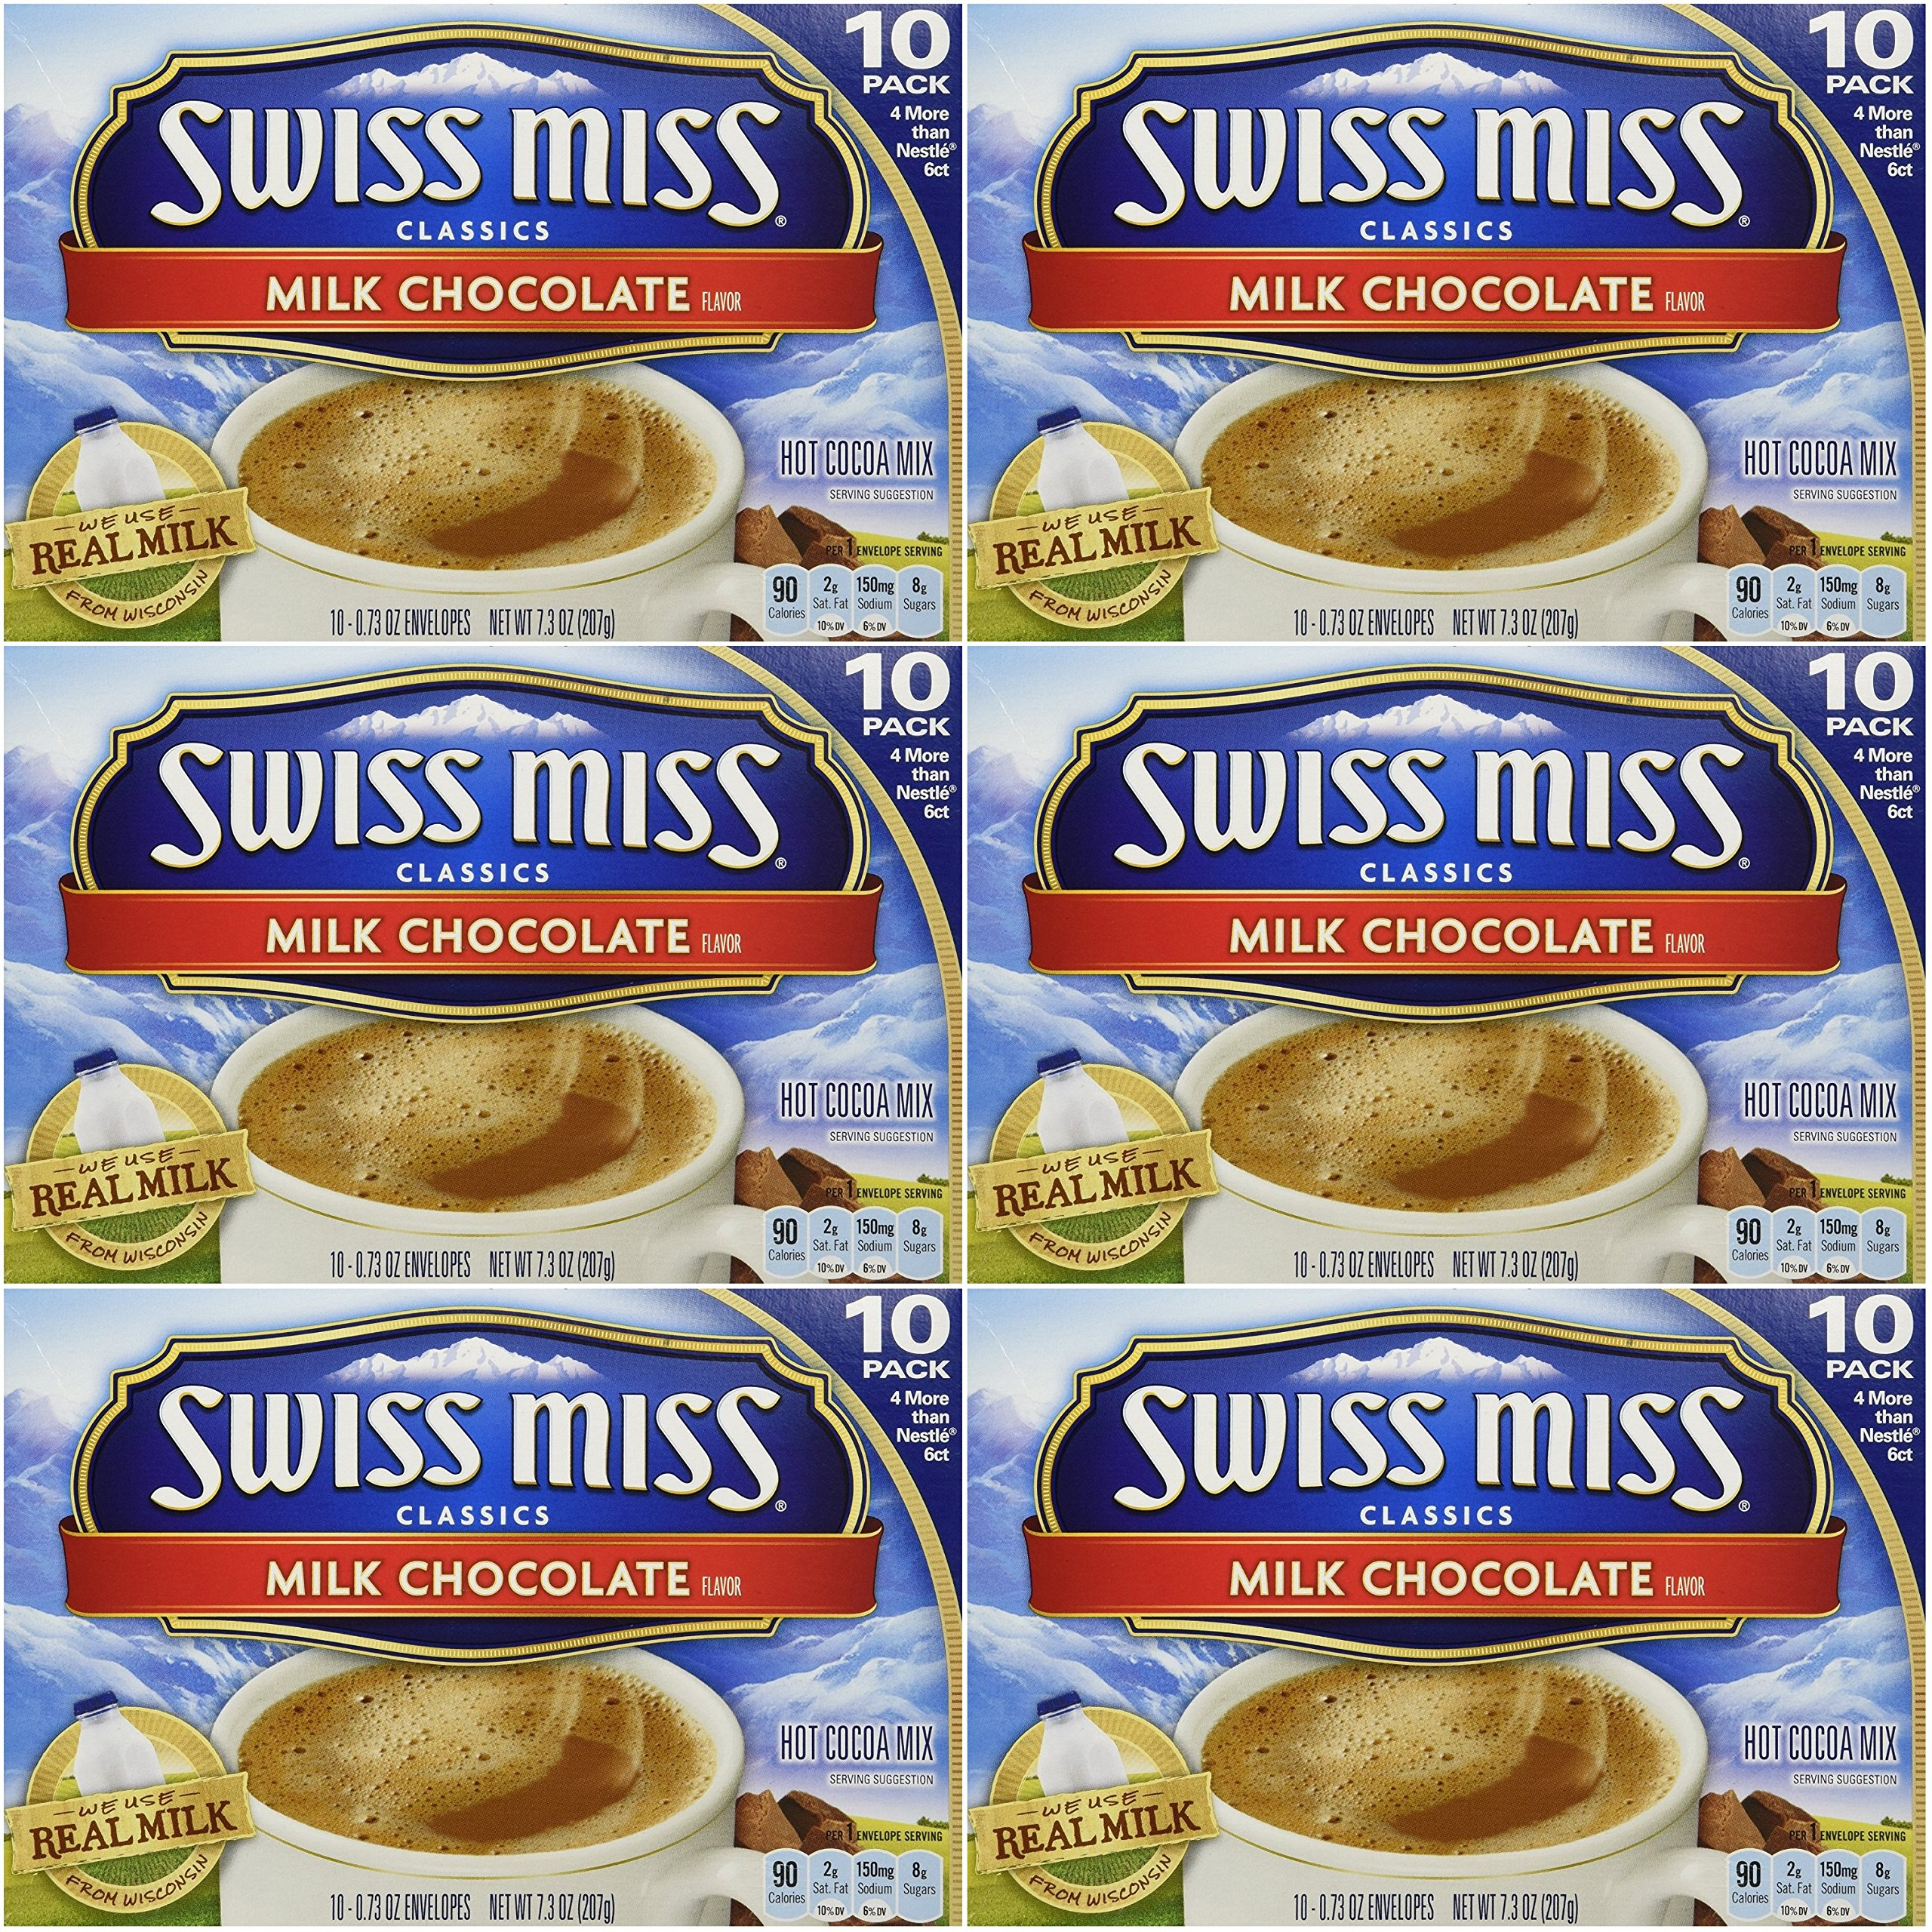 Swiss Miss Classics Milk Chocolate Hot Cocoa Mix, 60 - 0.73 oz envelopes